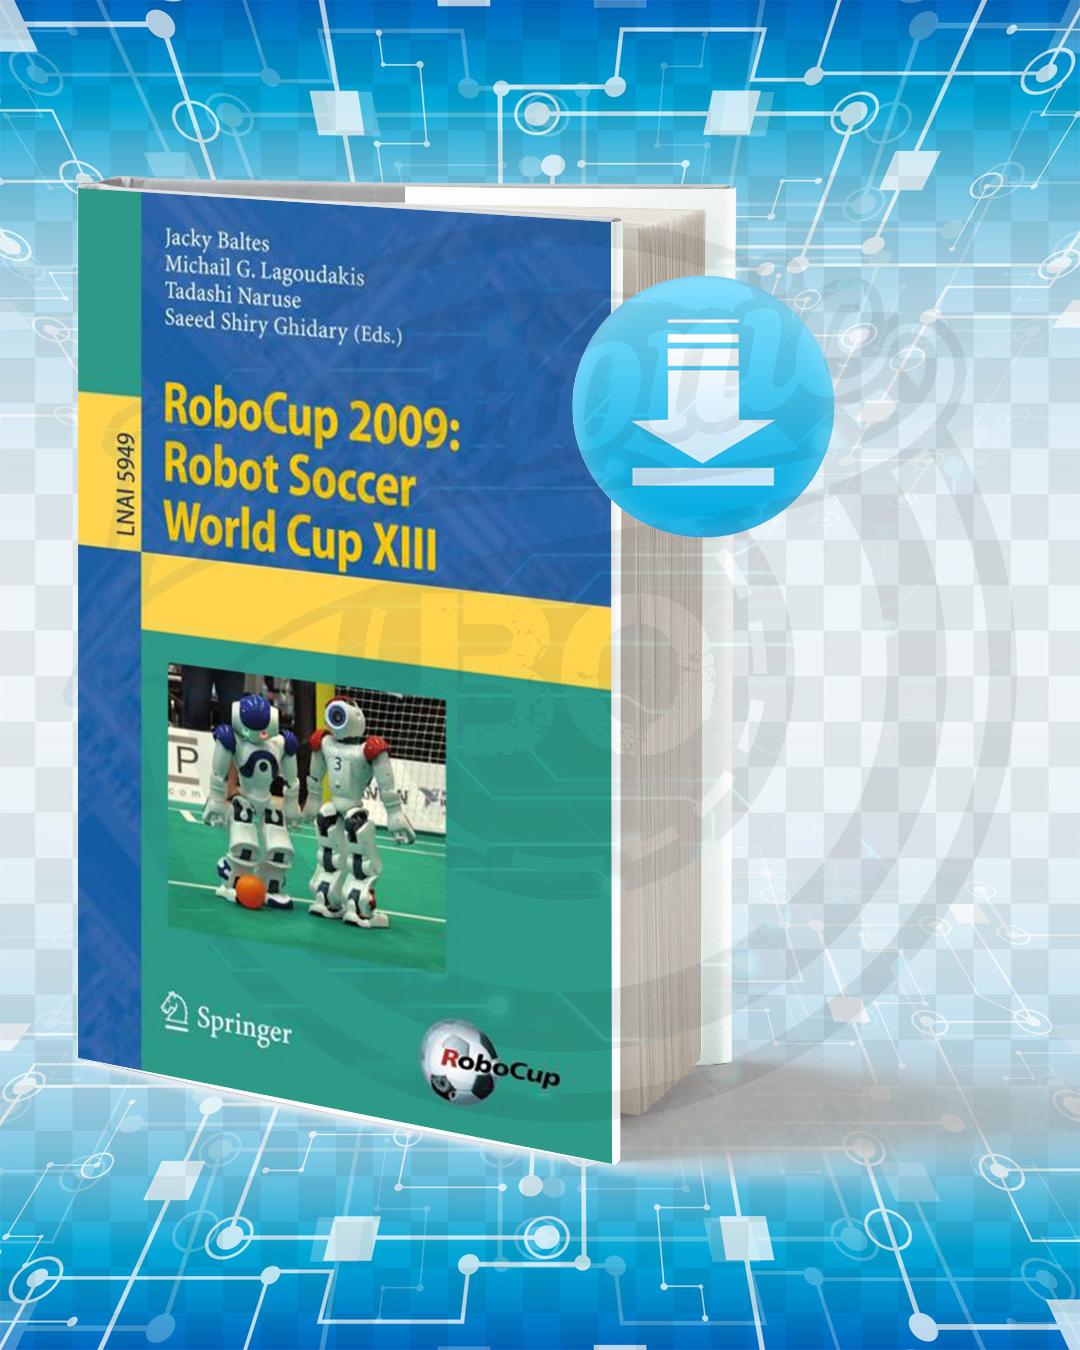 Free Book RoboCup 2009 pdf.